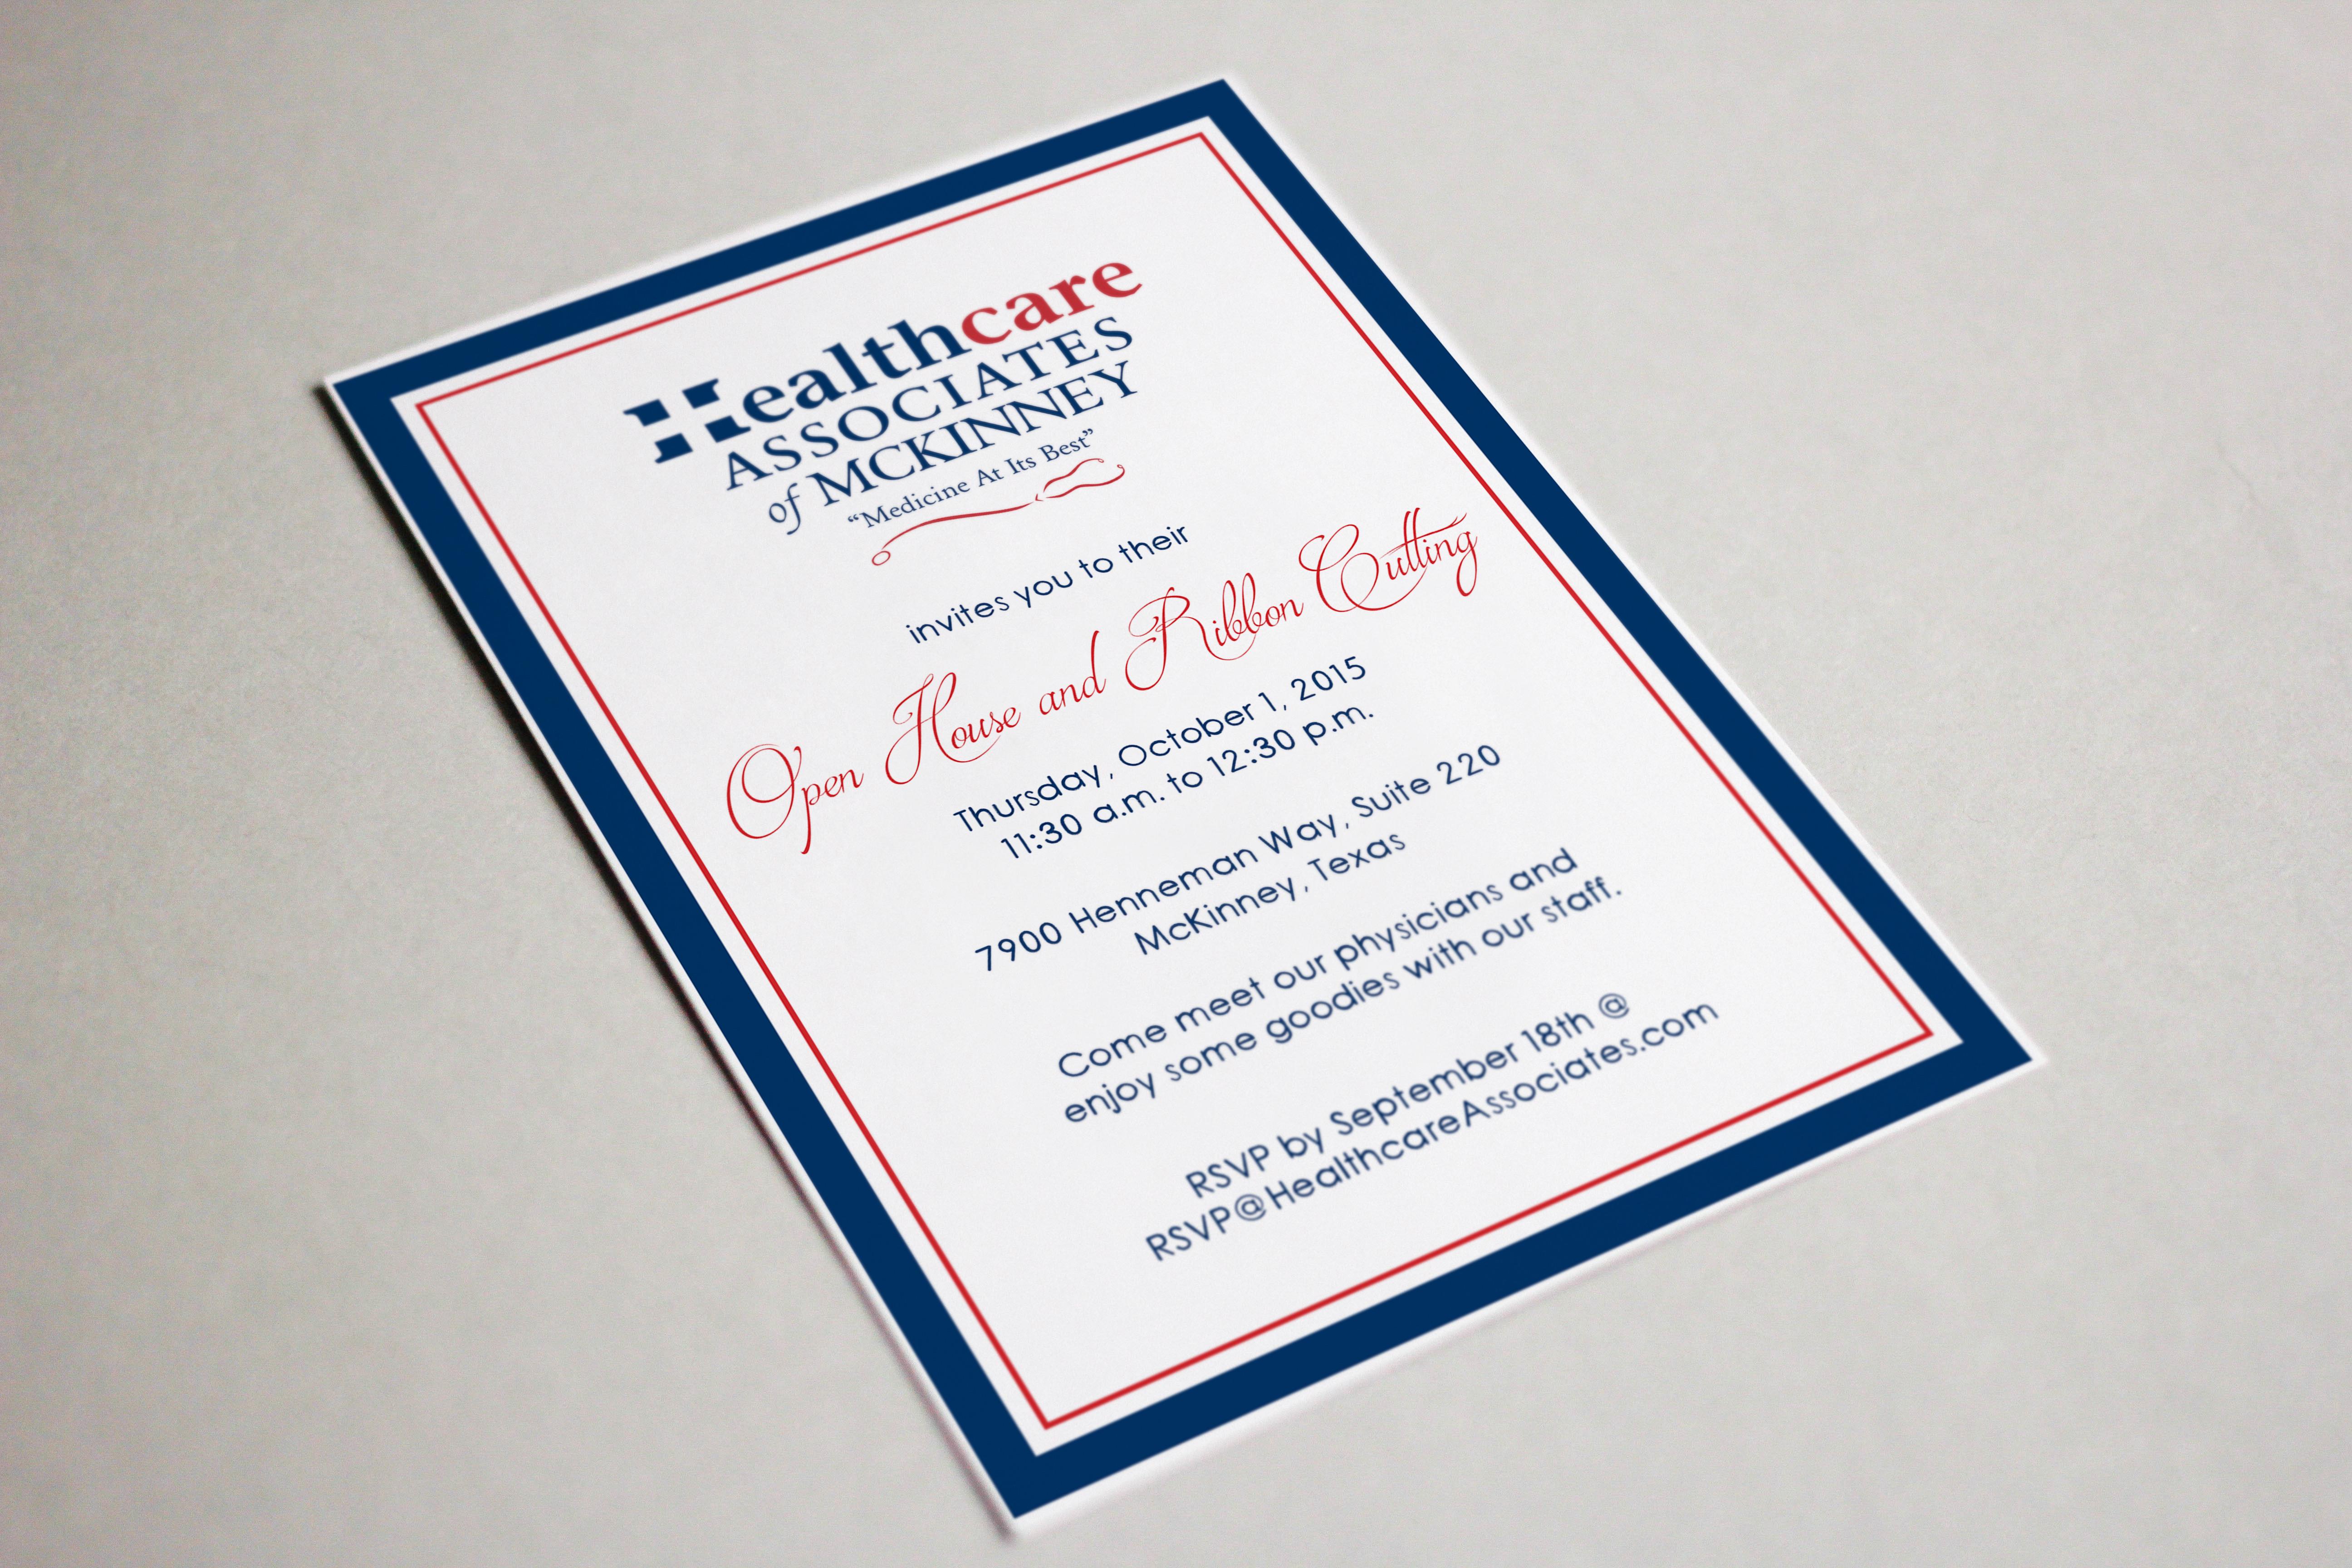 INVITATION l HCAT McKinney